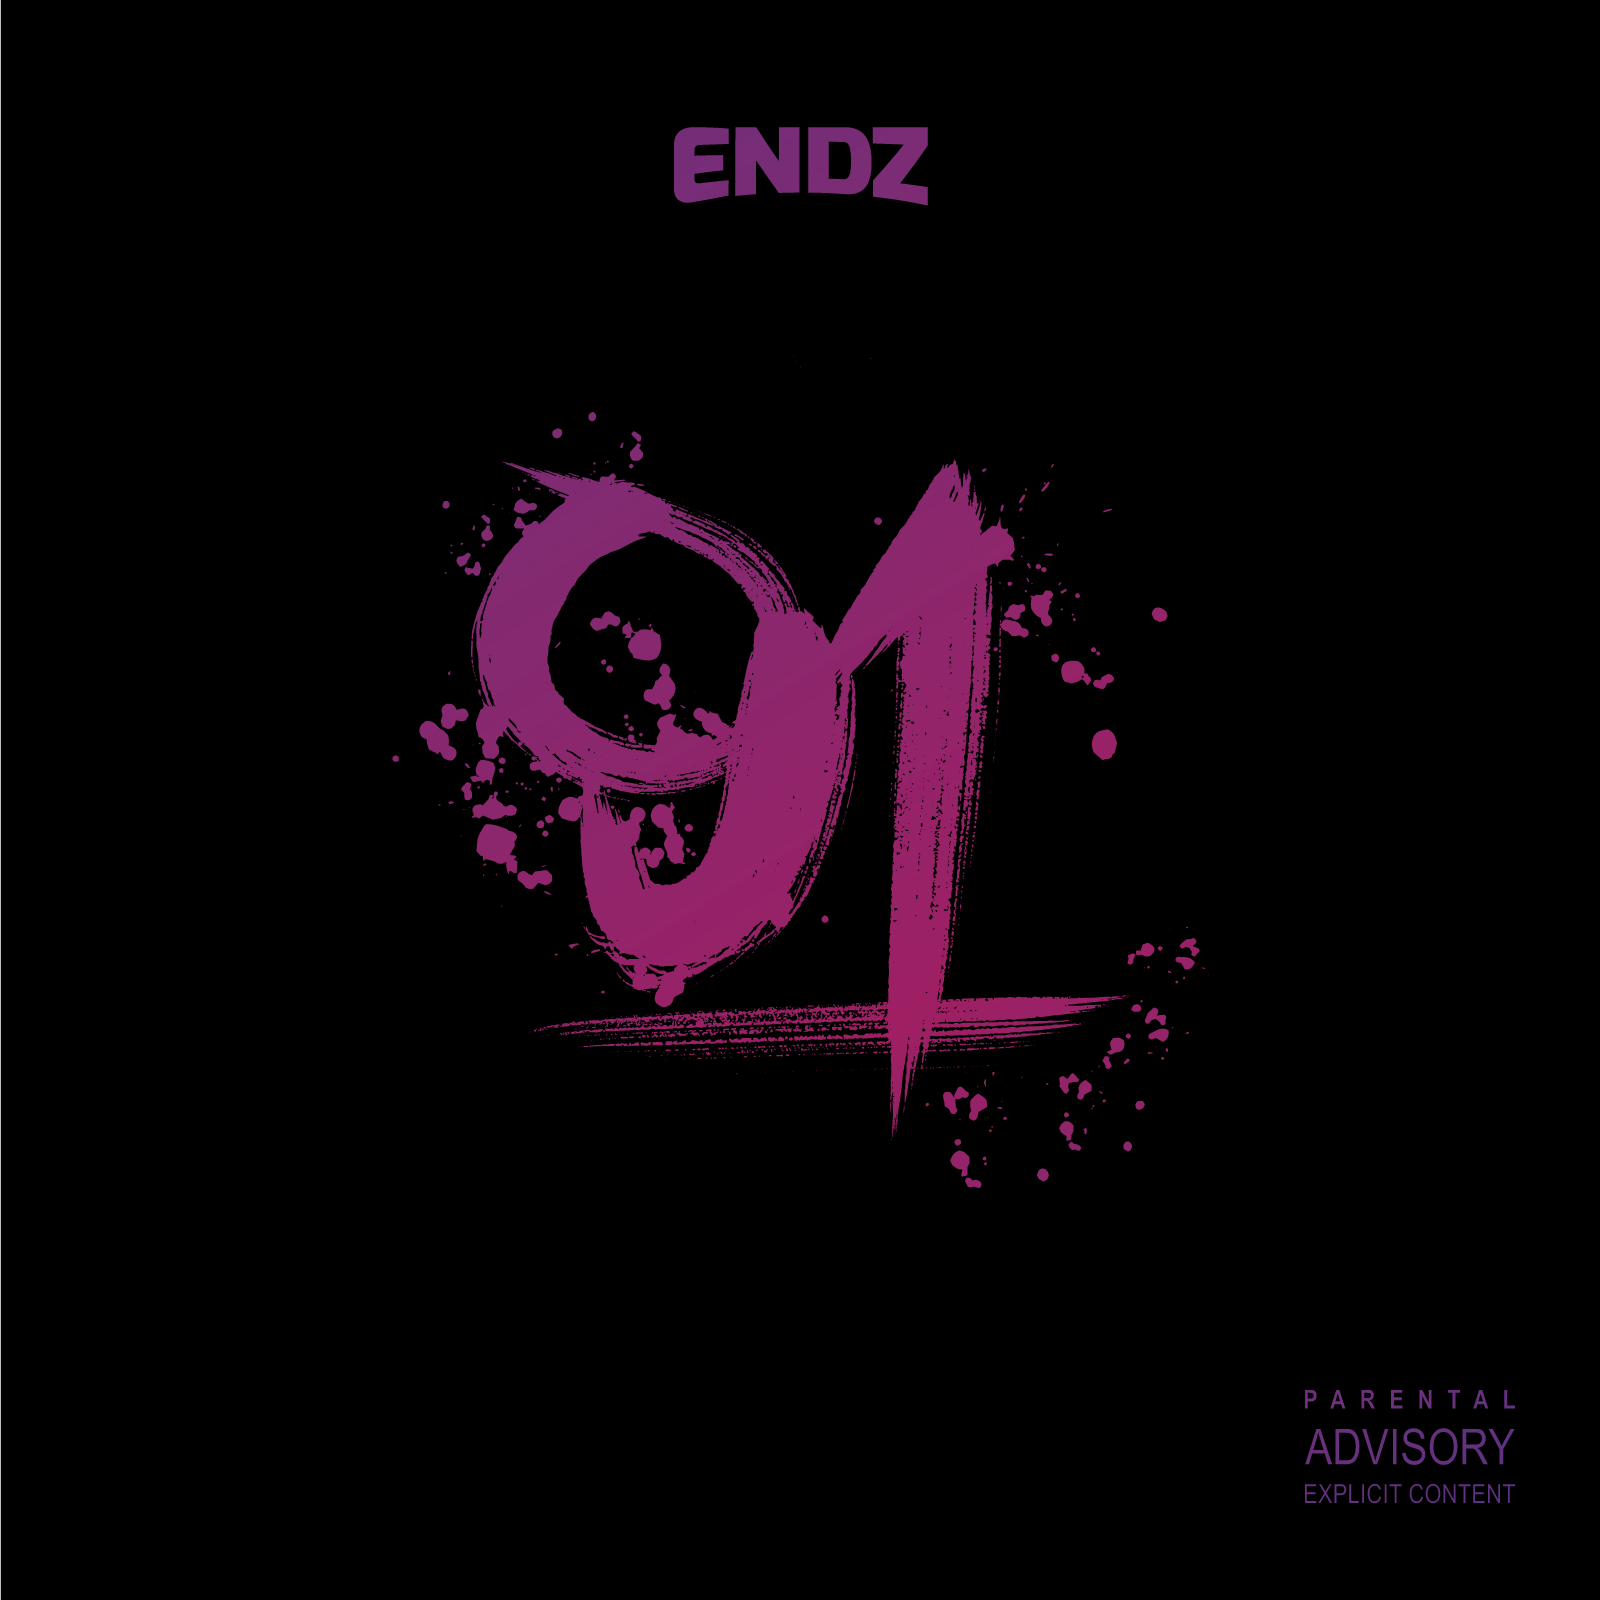 endz_91-3b.png